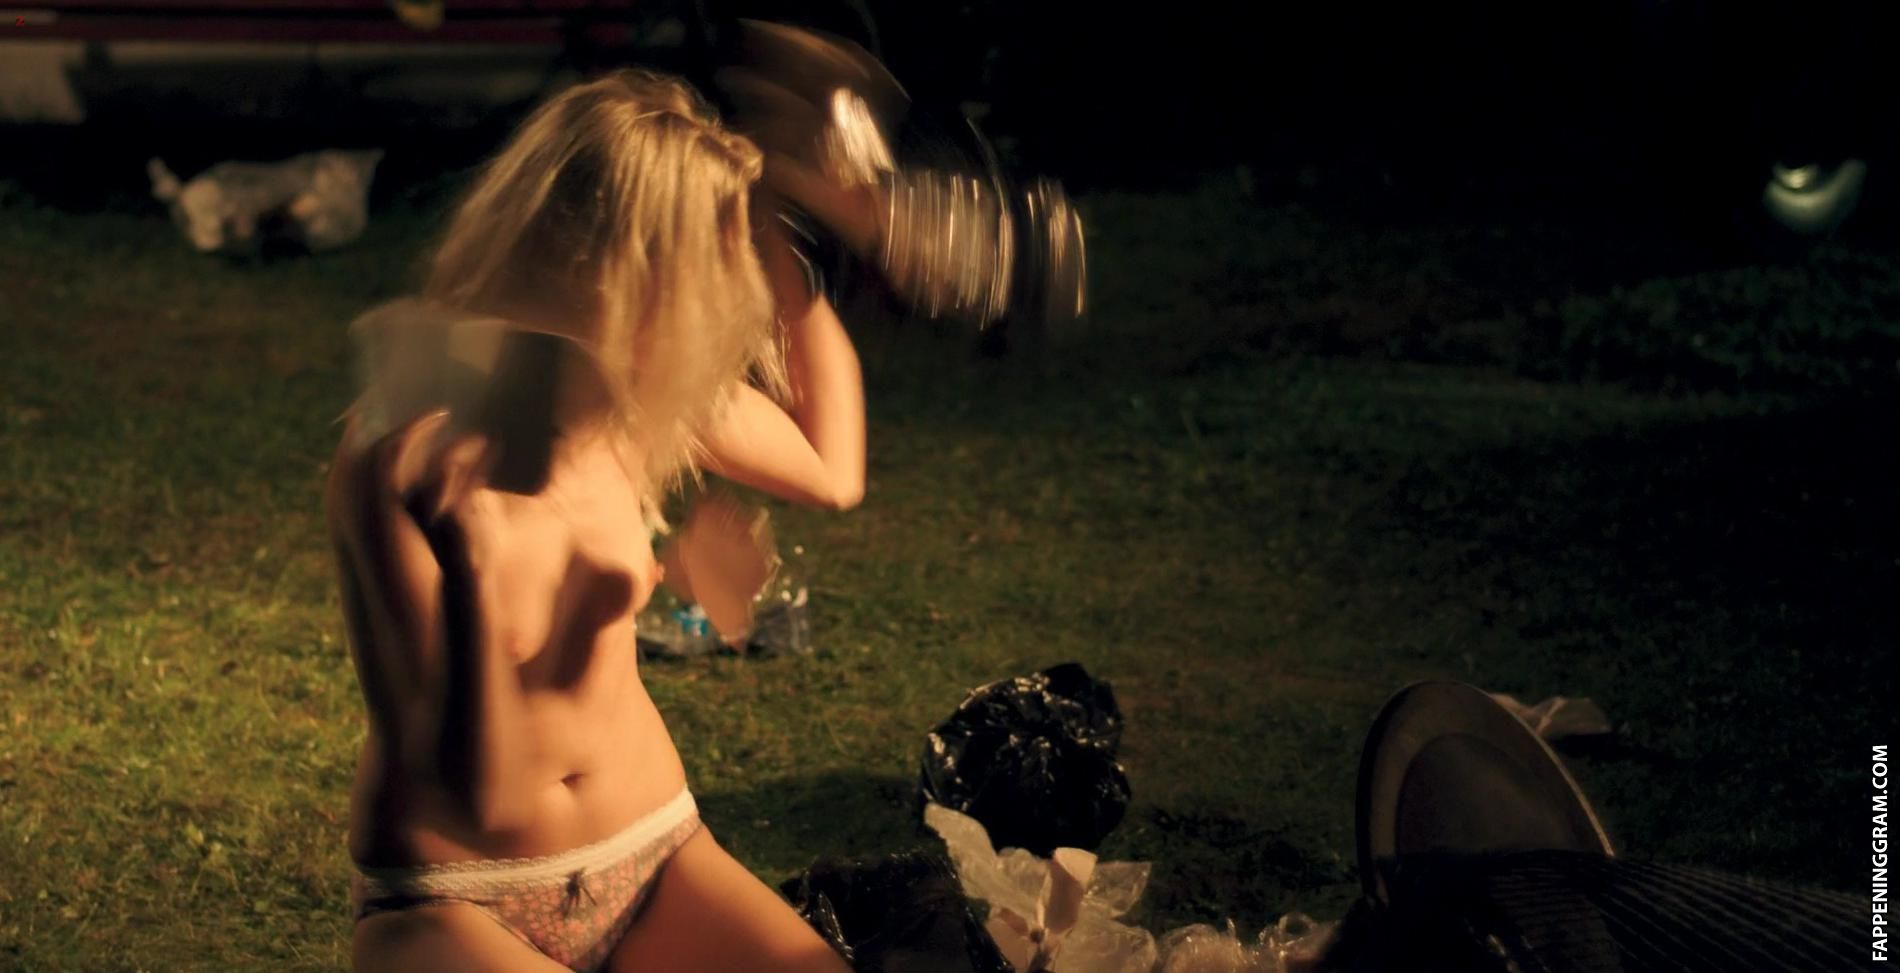 Nackt  Christiane Schaumburg 11 ting,